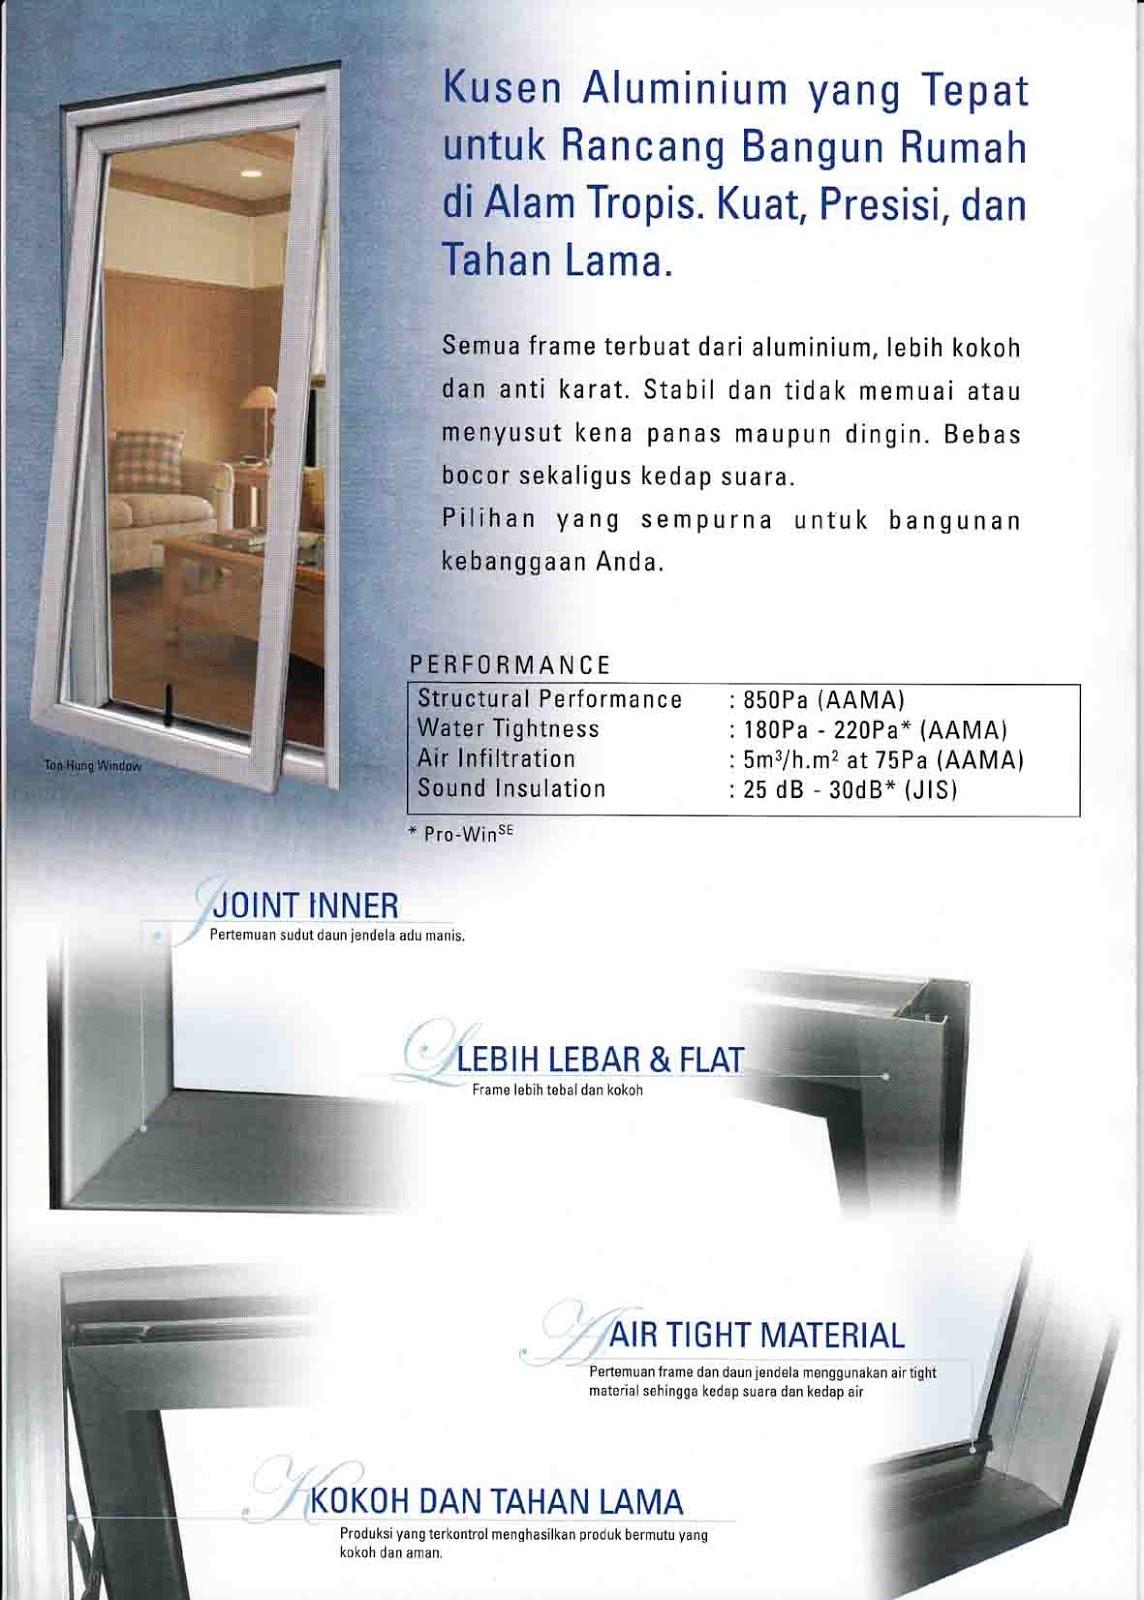 Harga jual kusen aluminium 2013 home design idea for Harga pembuatan kitchen set